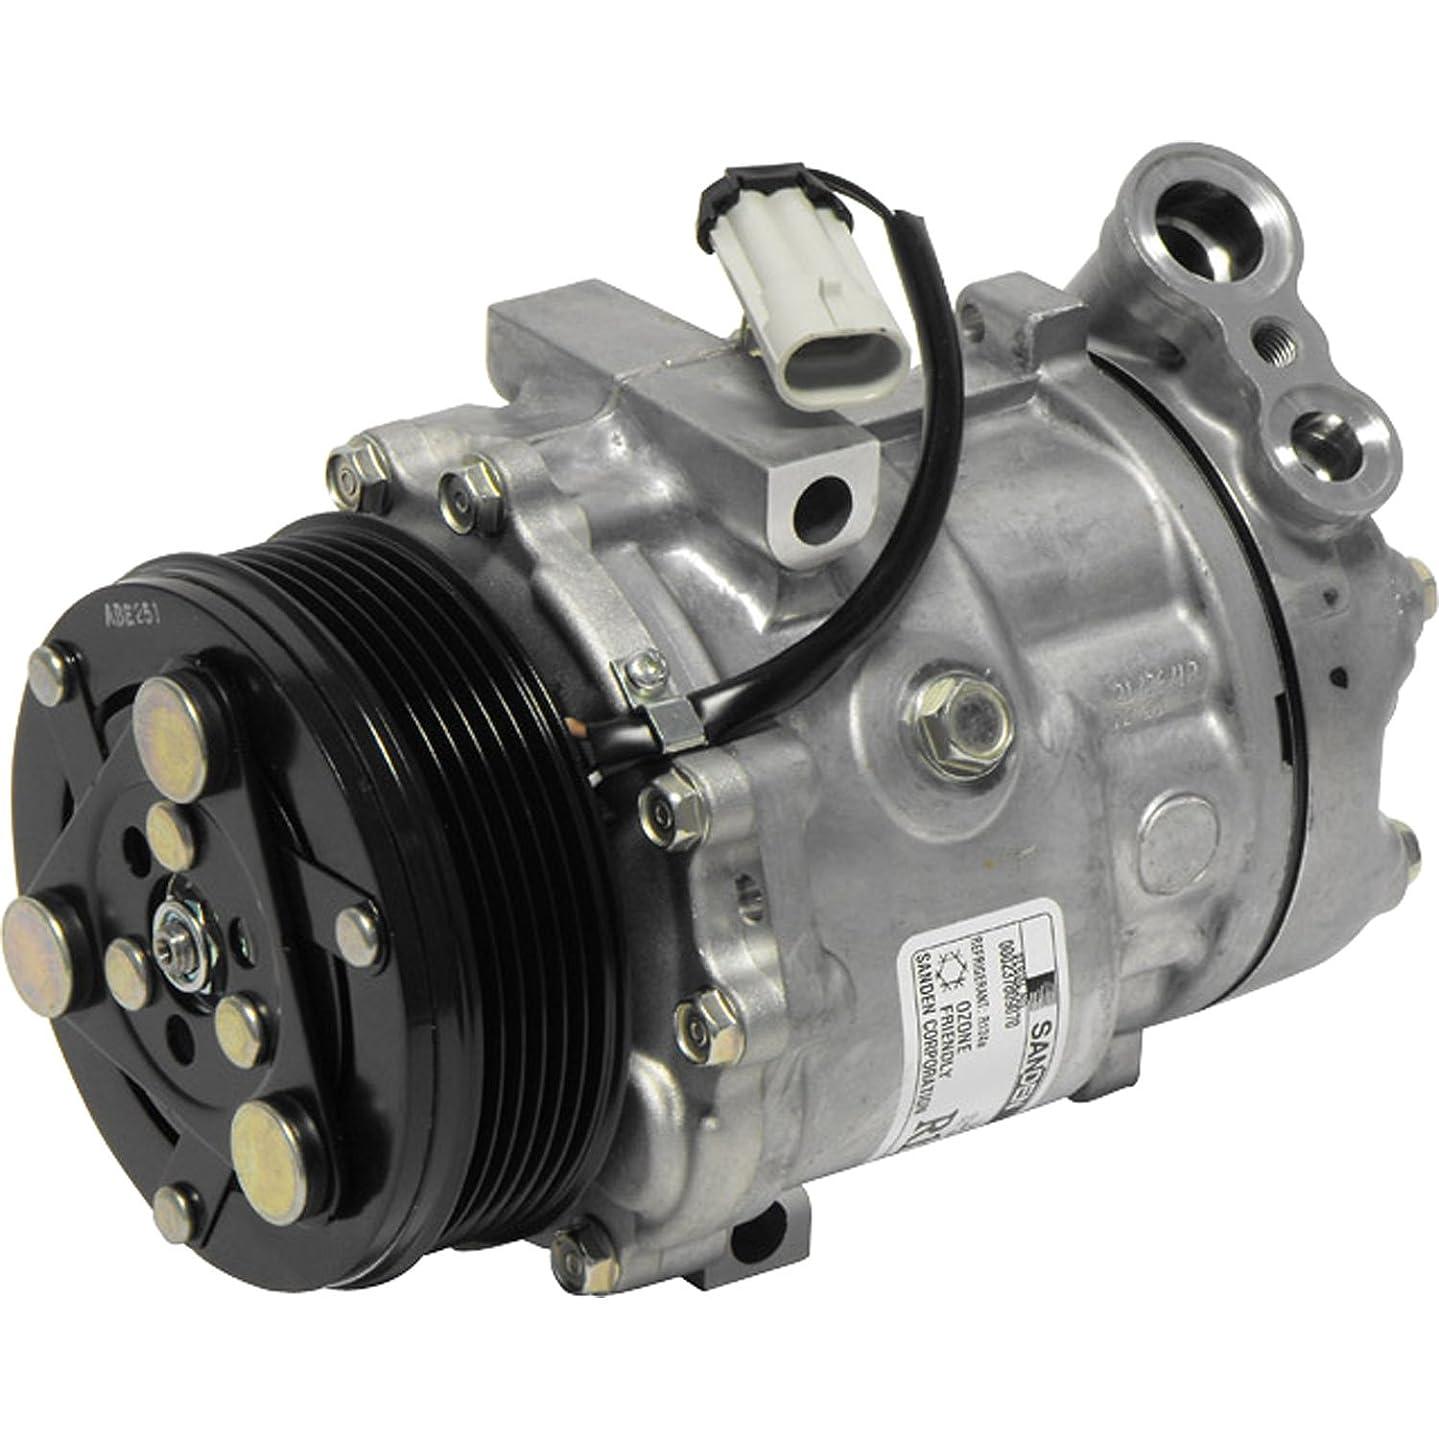 Universal Air Conditioner CO 4251 A/C Compressor